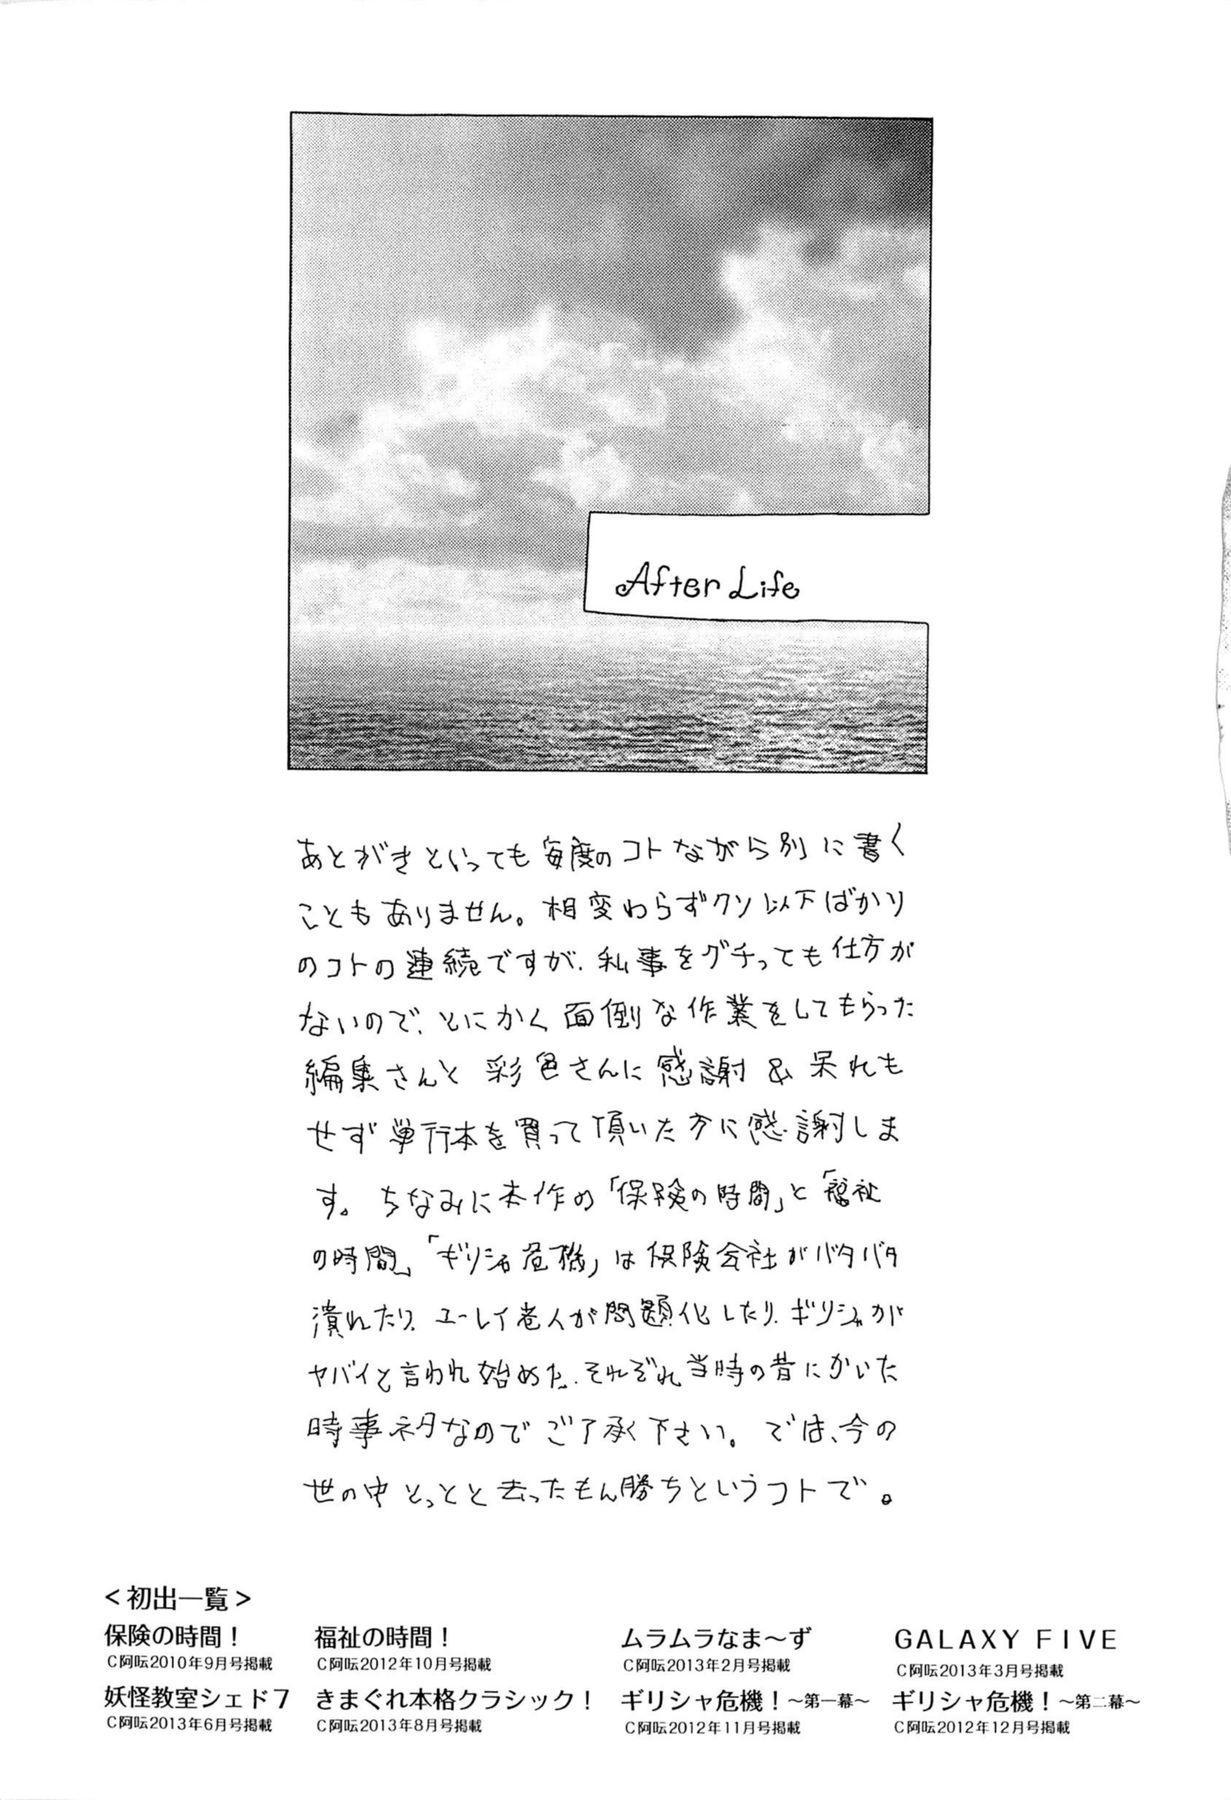 [Yosuteinu] The crysis of greece chapter 1-3 (FINAL)  - saint seiya 48